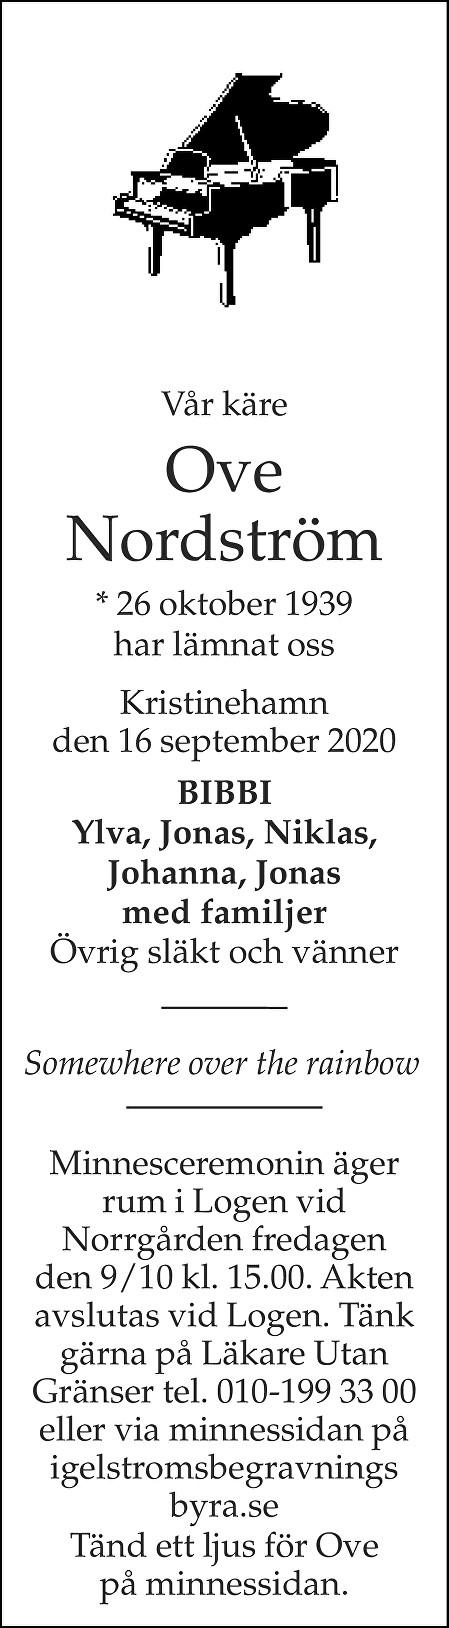 Ove Nordström Death notice